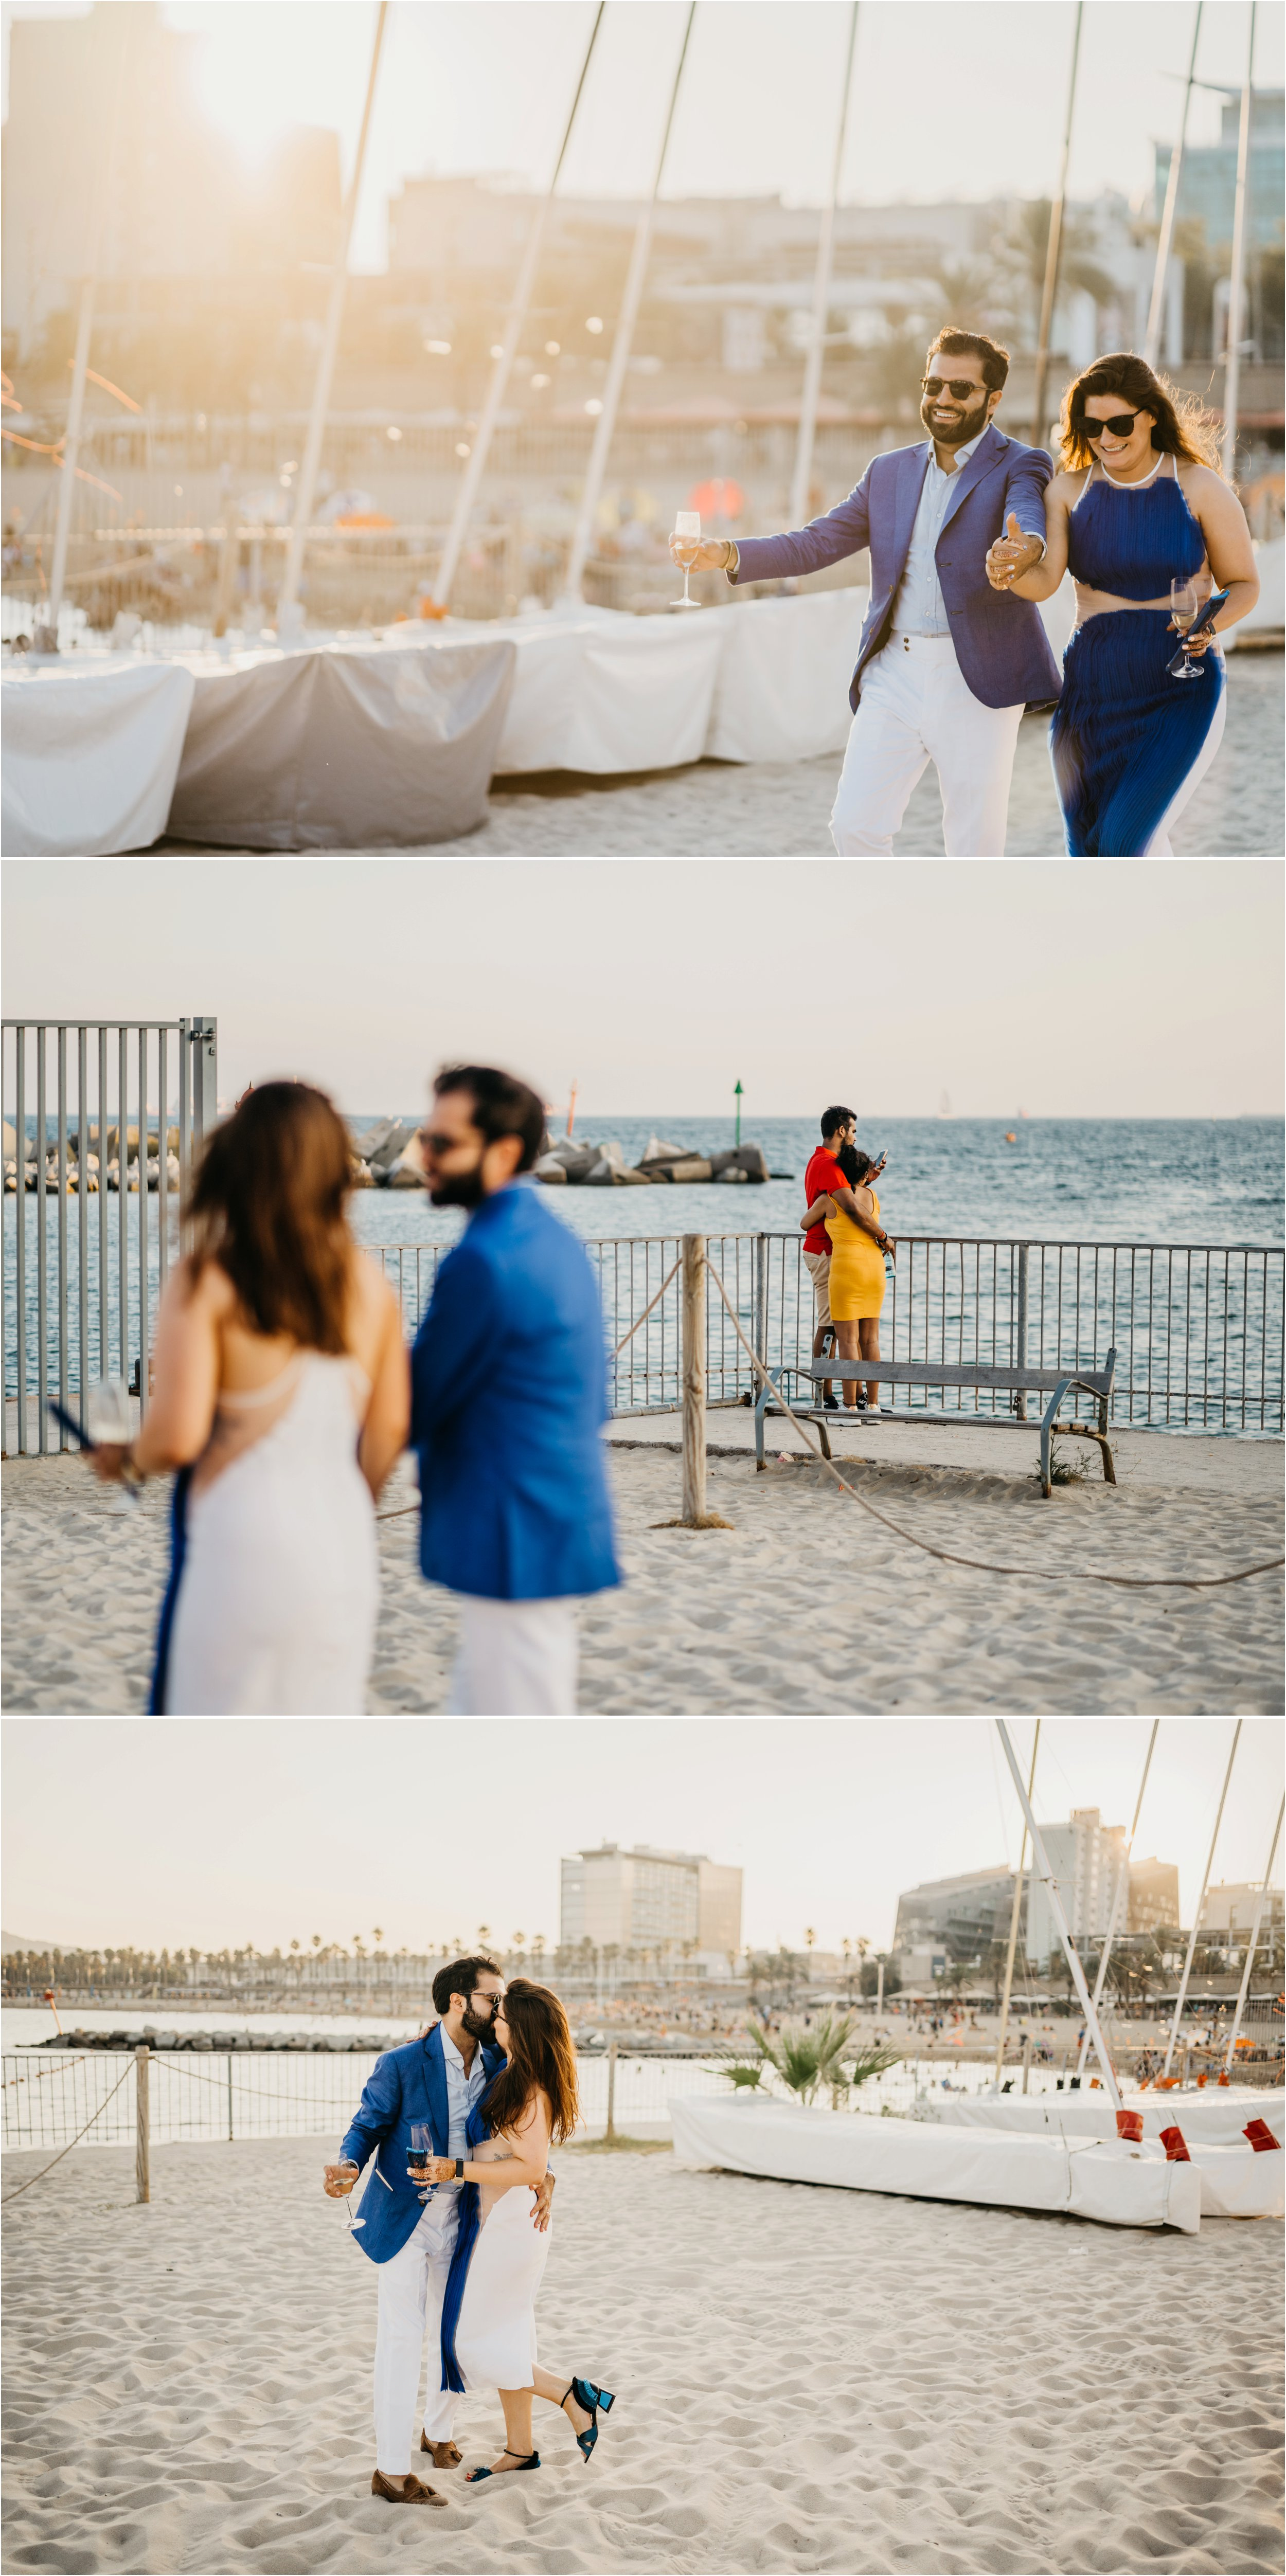 Barcelona Spain destination wedding photographer_0139.jpg